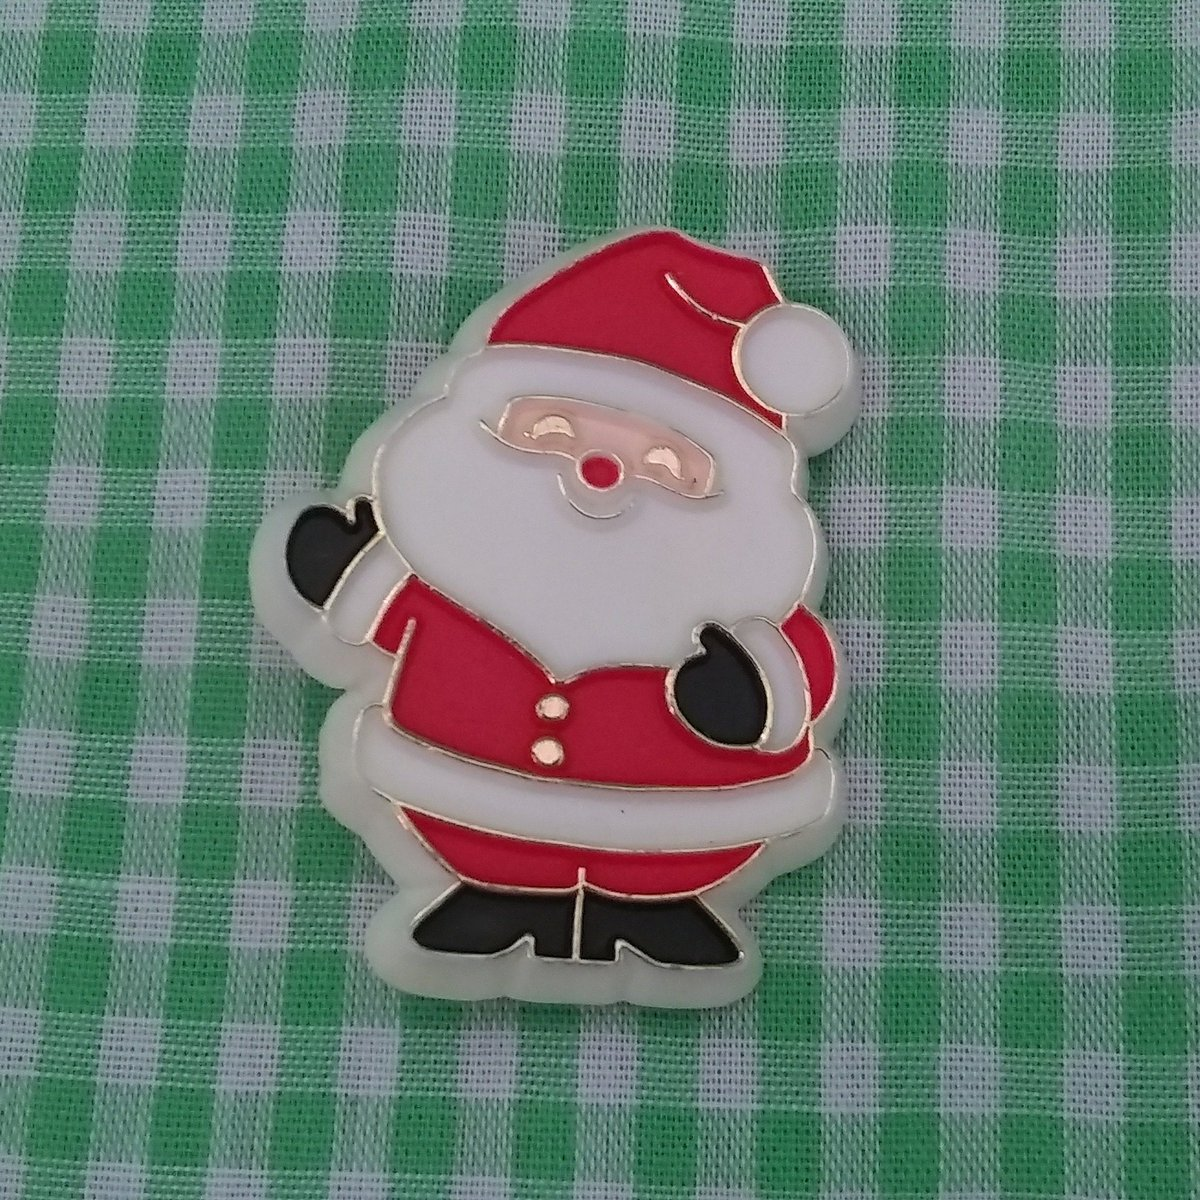 Vintage Santa Claus Brooch or Pin 1981 Hallmark Christmas Jewelry  #white #christmas #red #plastic #santaclaus #santapin #santabrooch #vintagesantaclaus #stnicholas